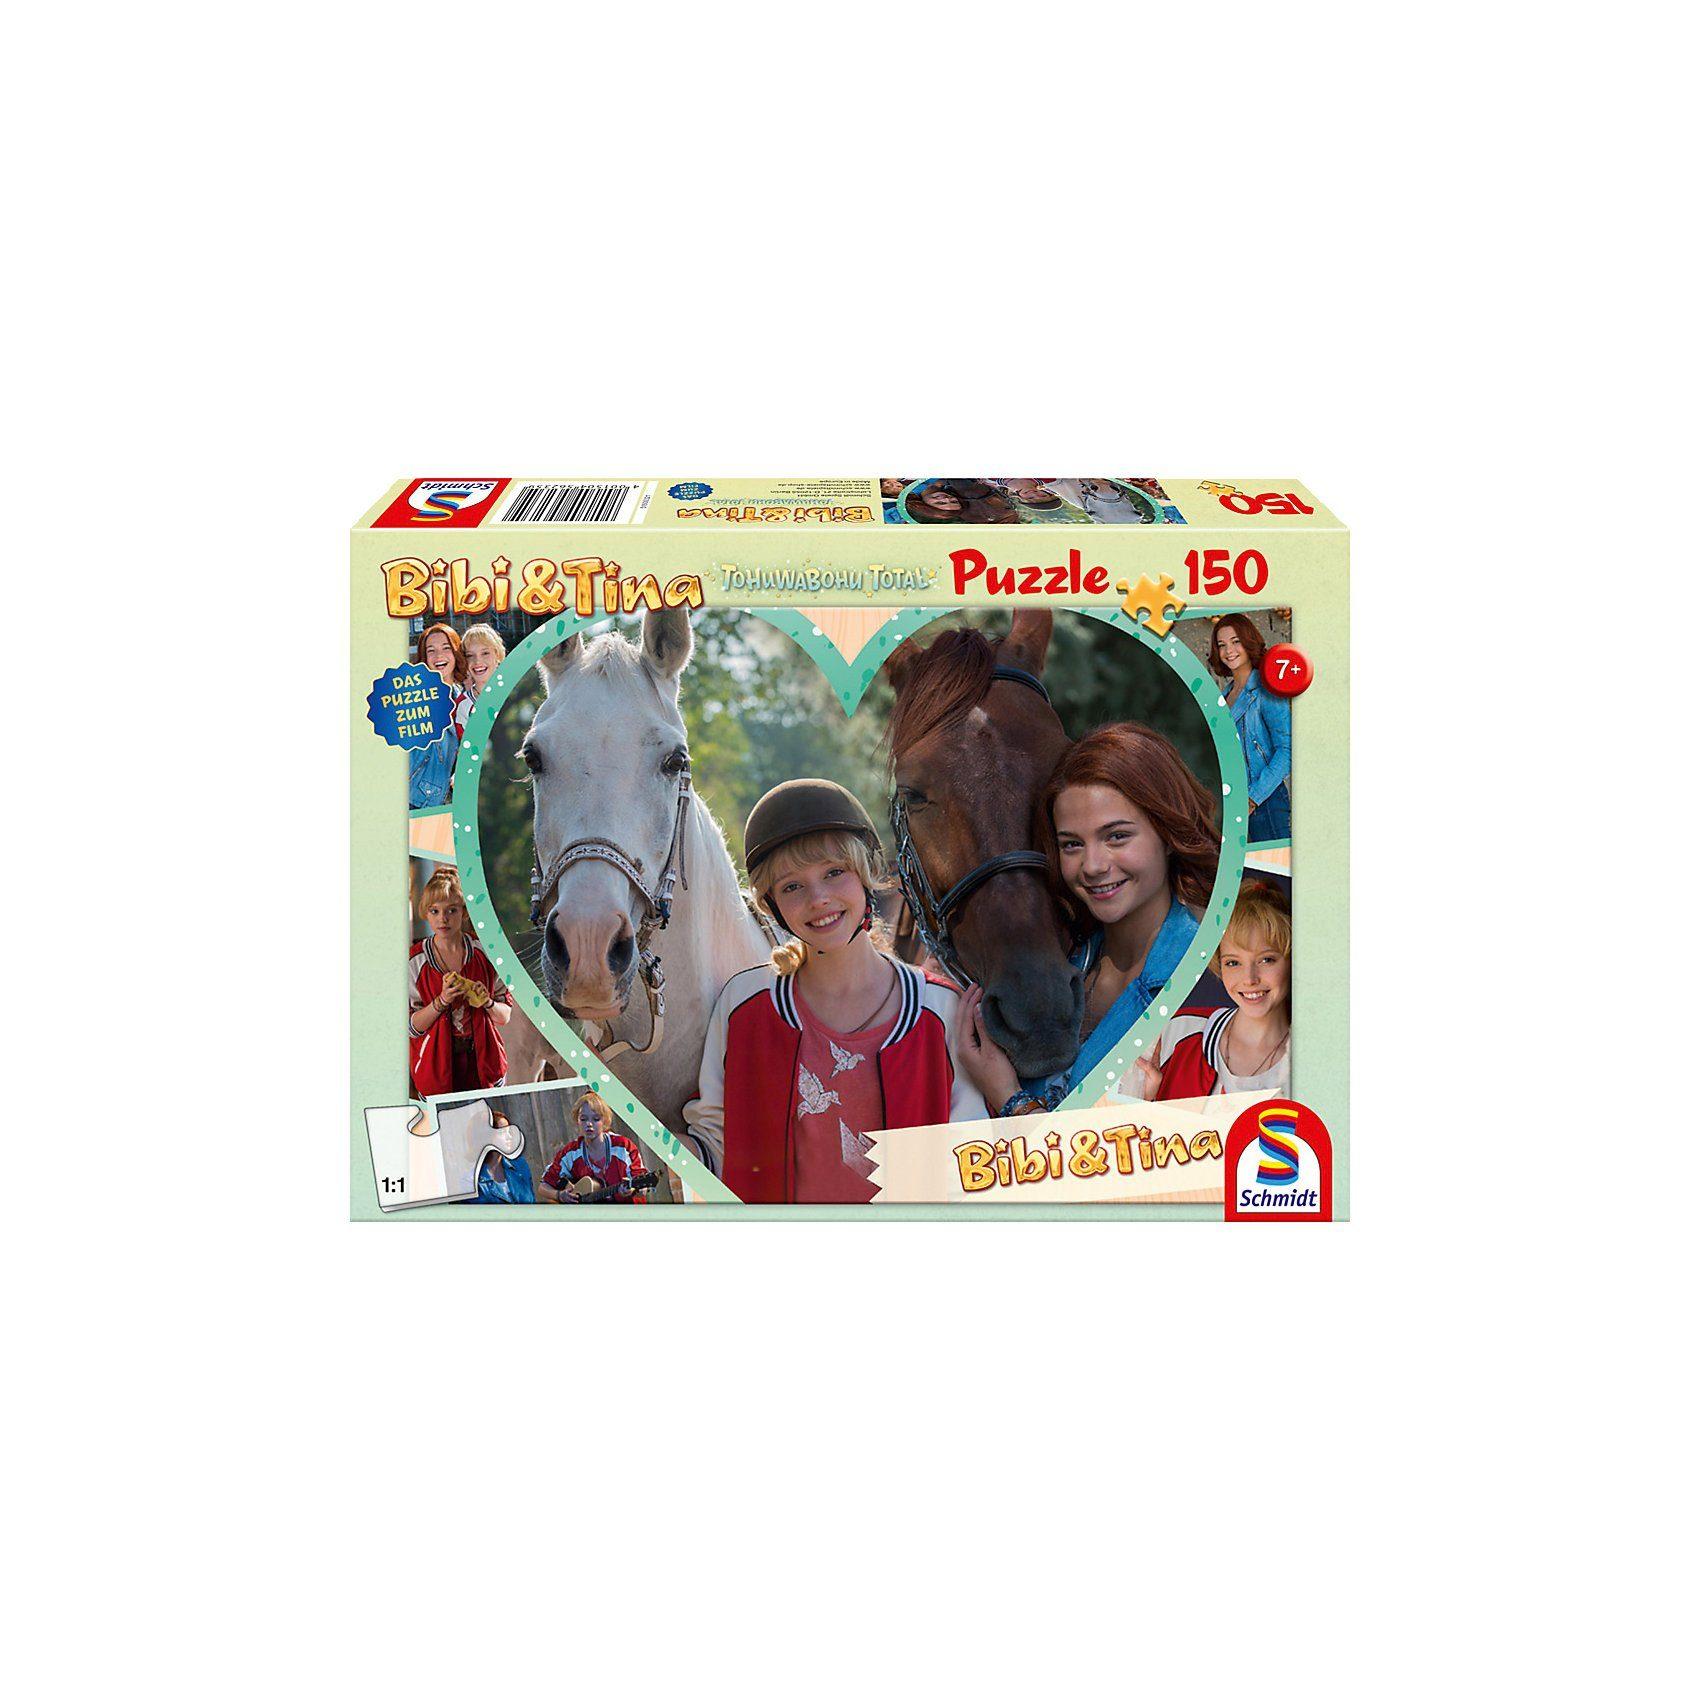 Schmidt Spiele Puzzle Bibi & Tina zum Kinofilm Tohuwabohu Total, Mädchenfre